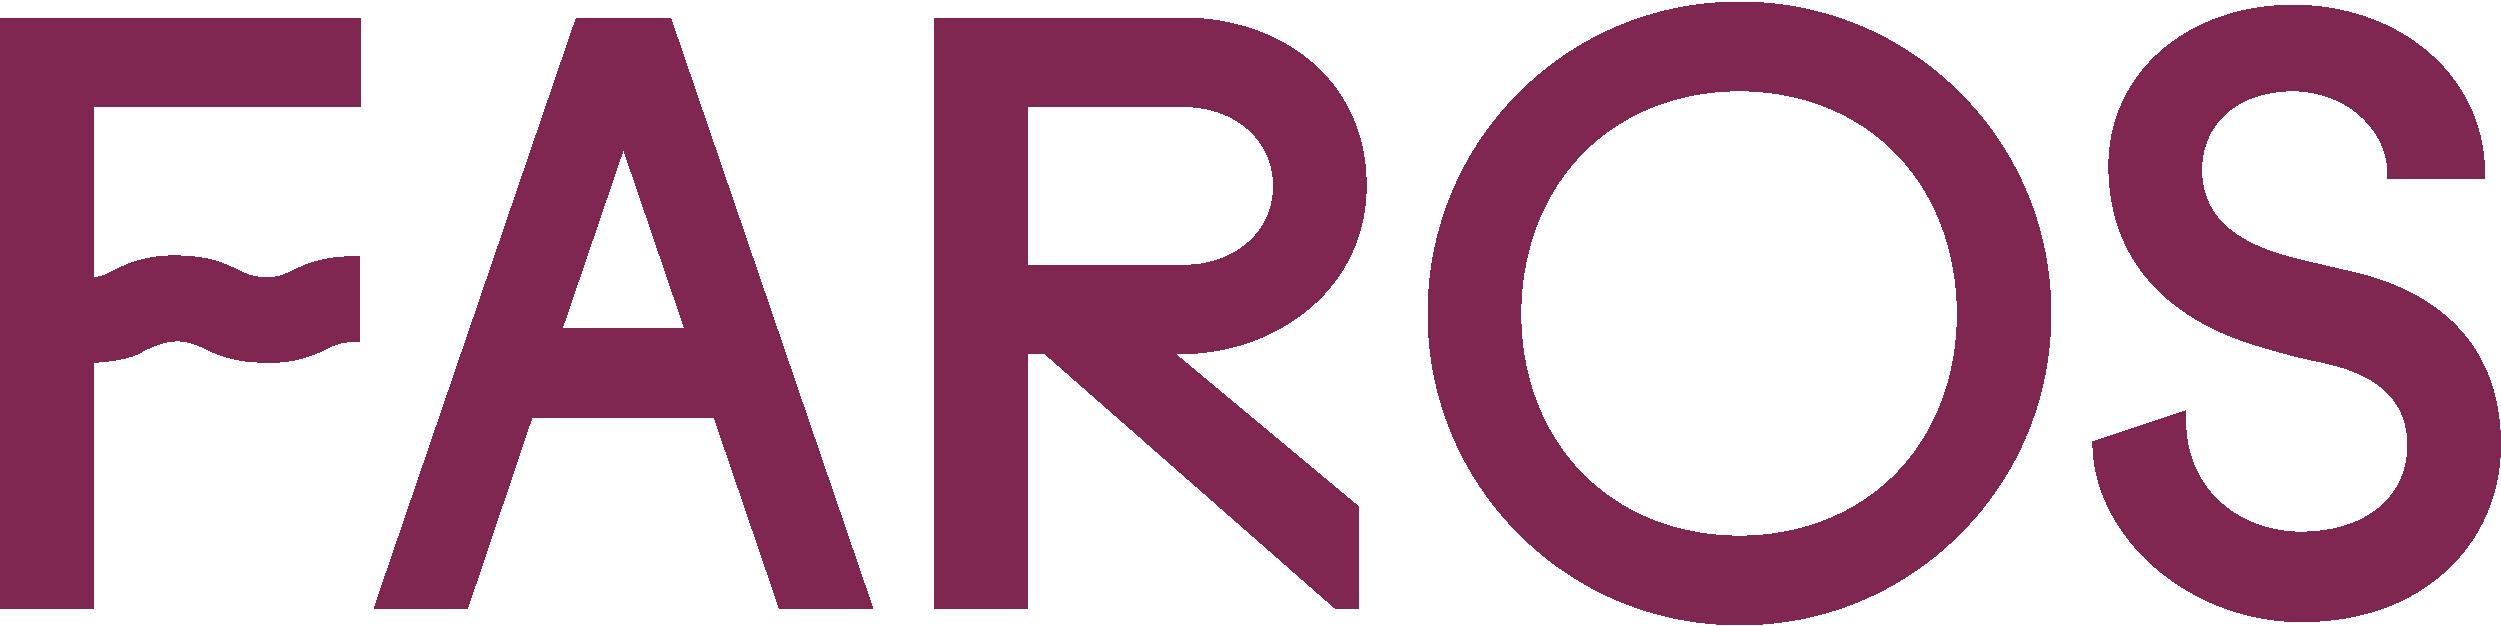 Faros logo